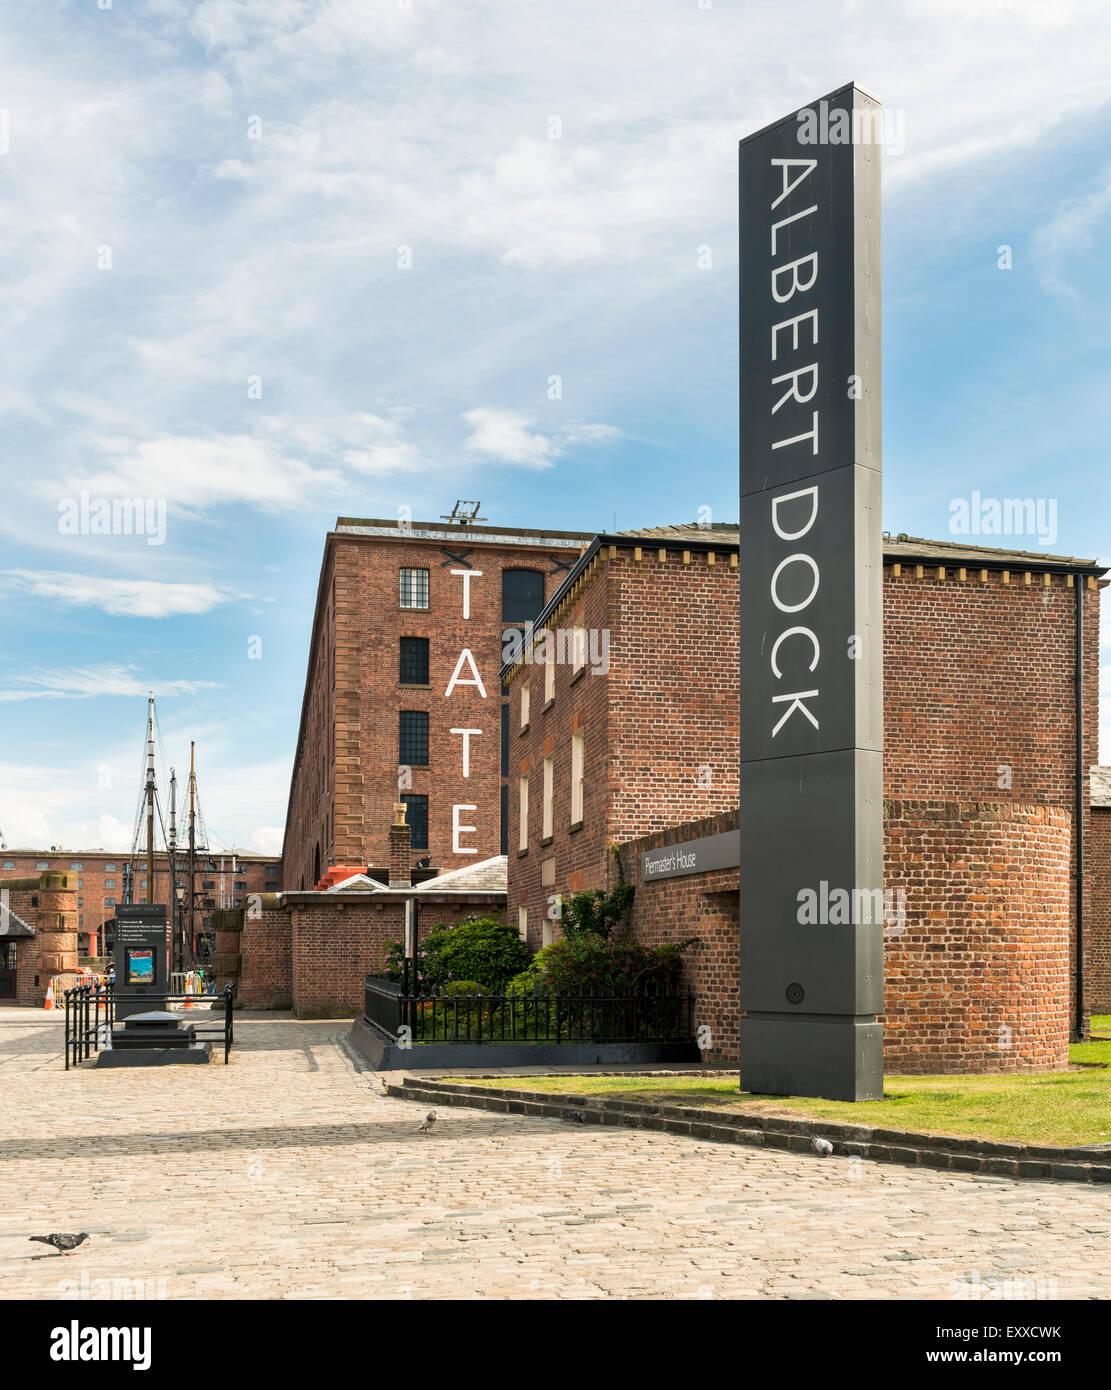 Albert Dock and Tate Liverpool, UK - Stock Image